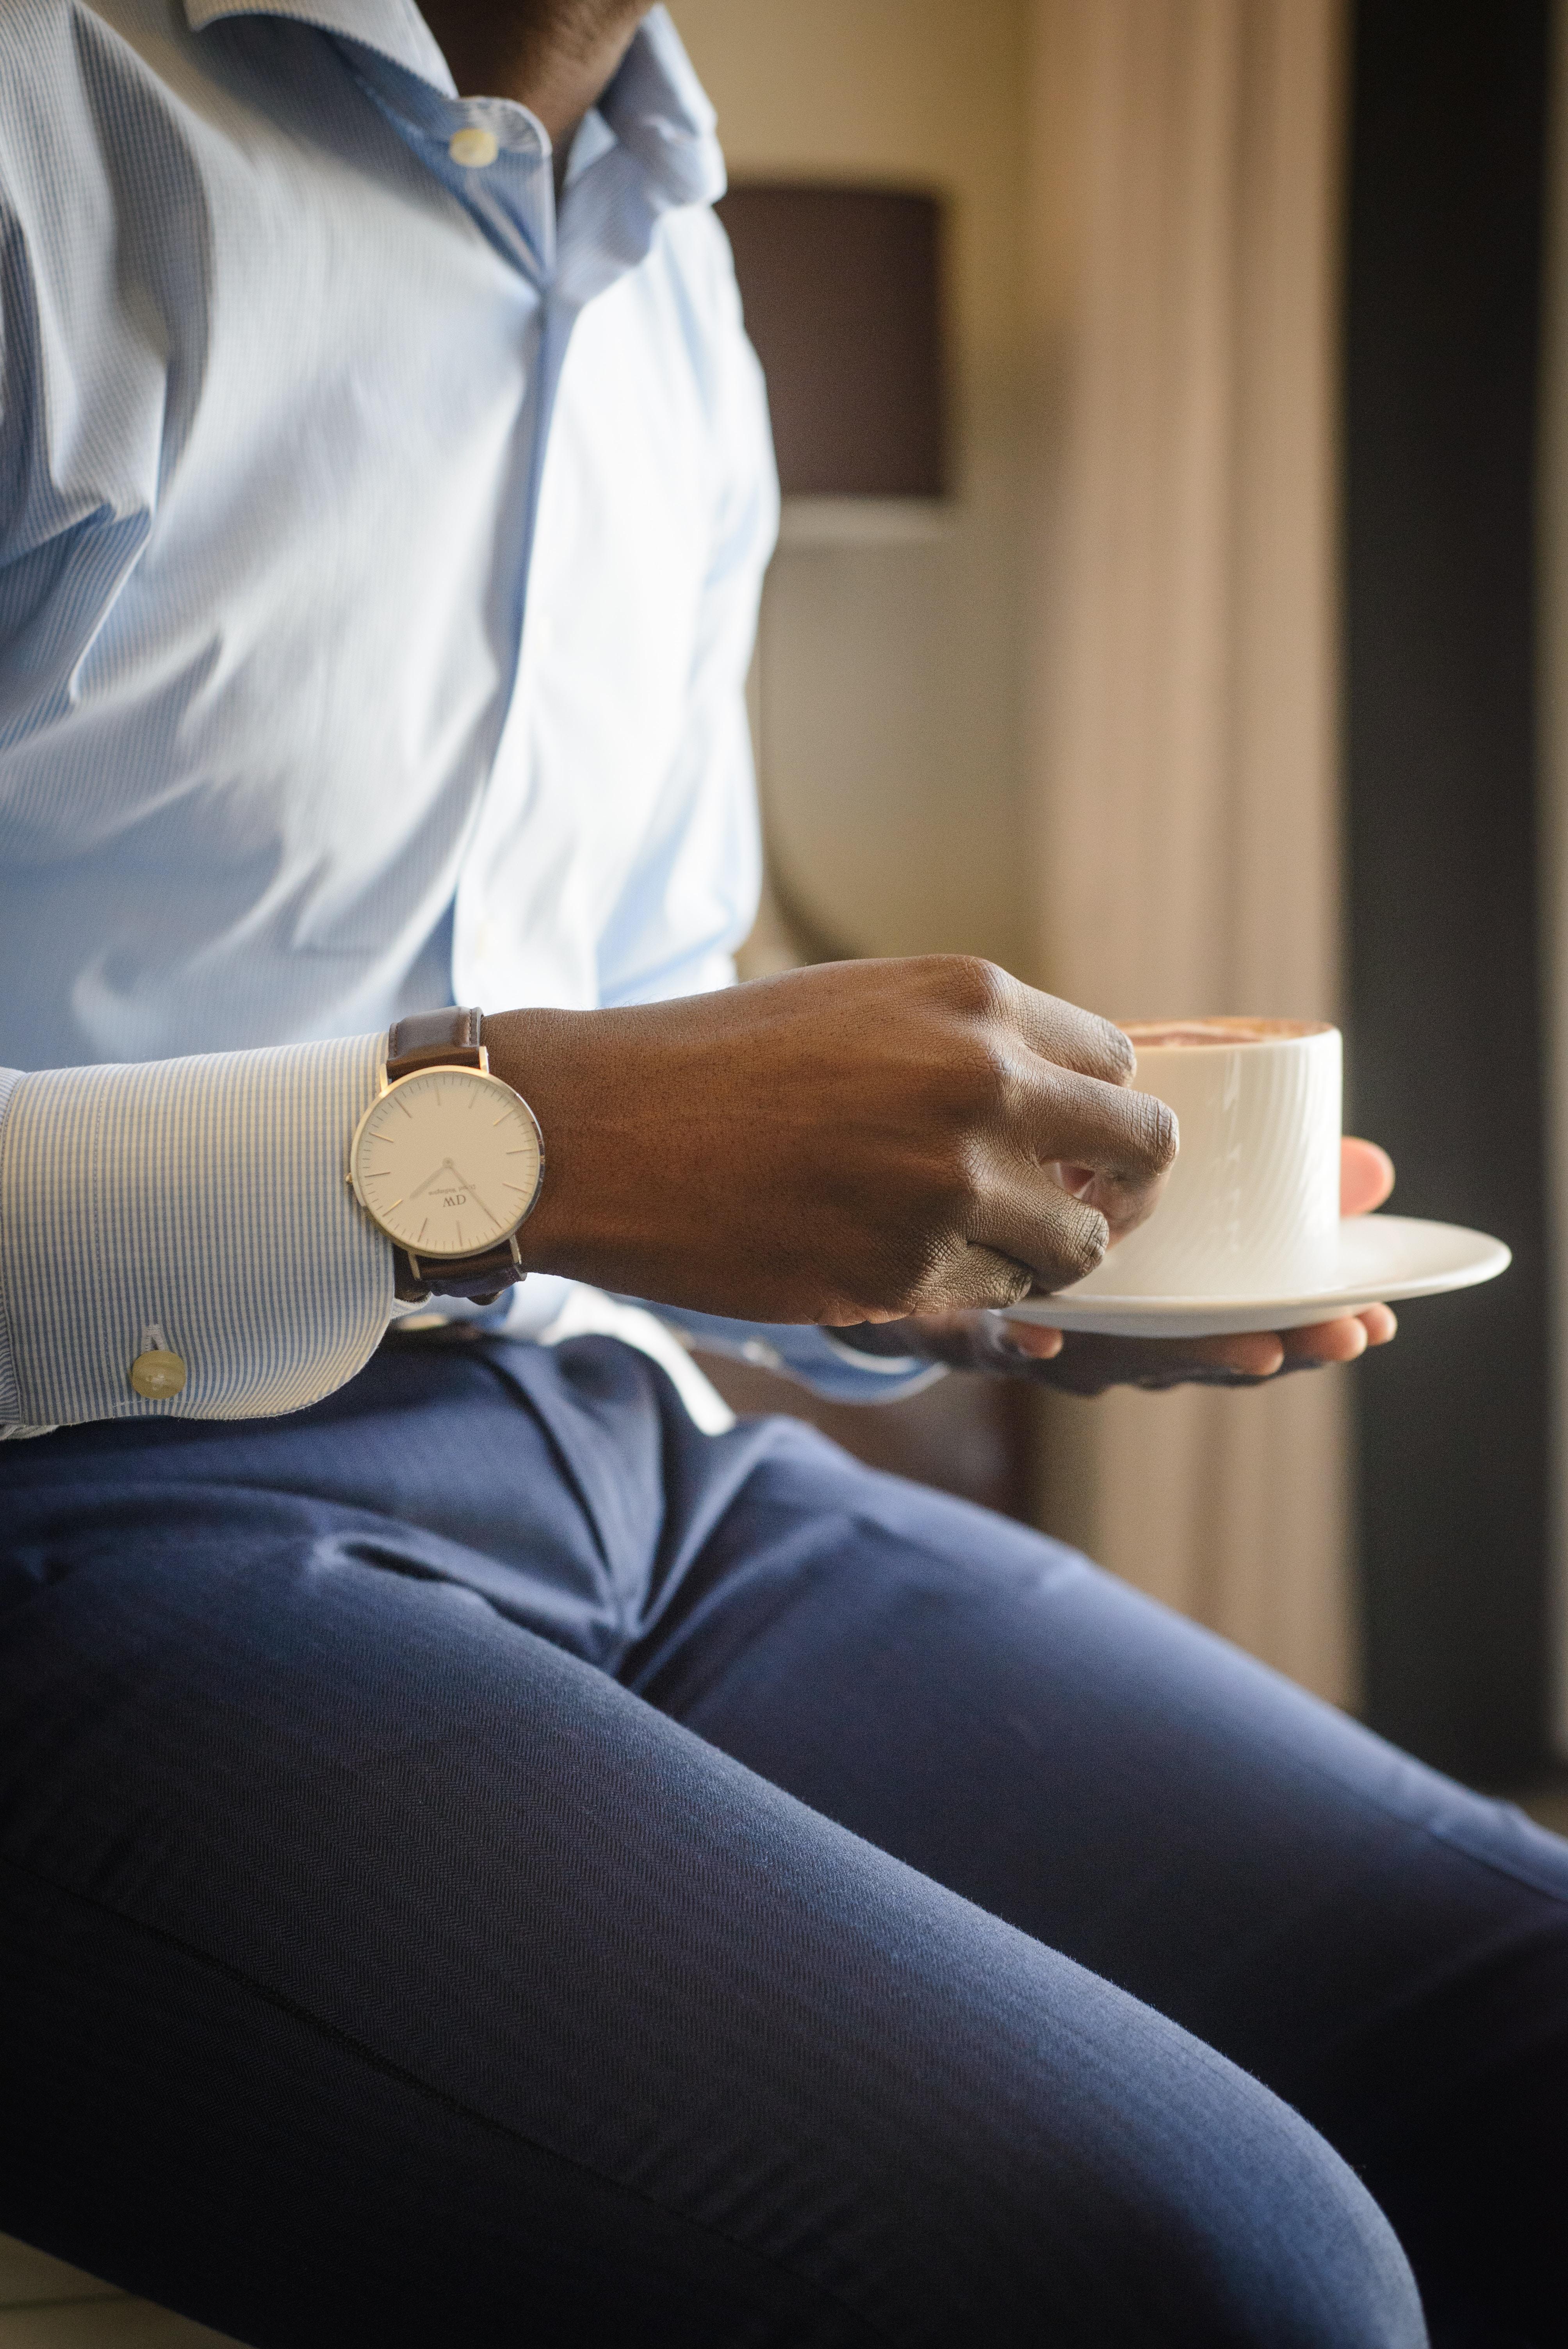 man holding teacup and saucer